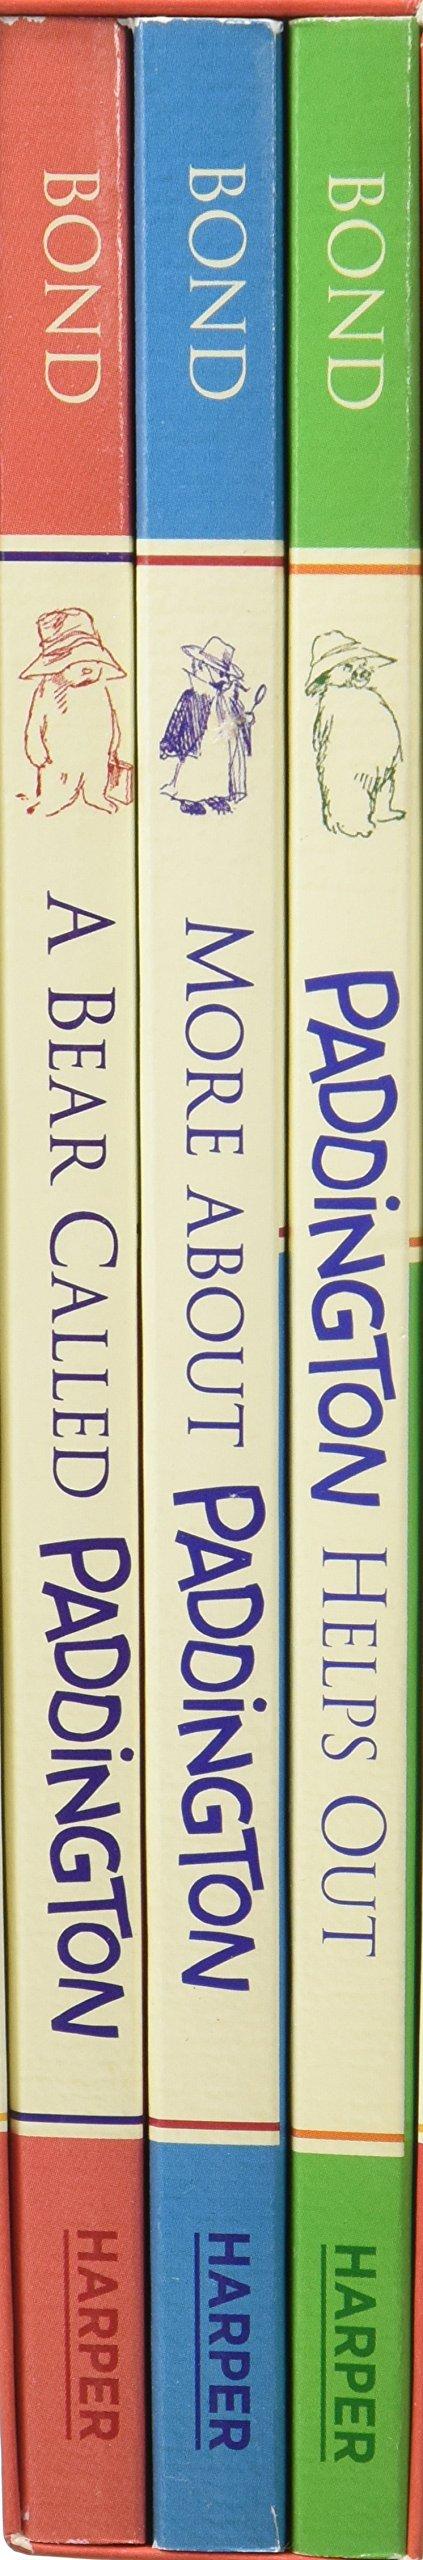 Paddington Classic Adventures Box Set  A Bear Called Paddington More About Paddington Paddington Helps Out